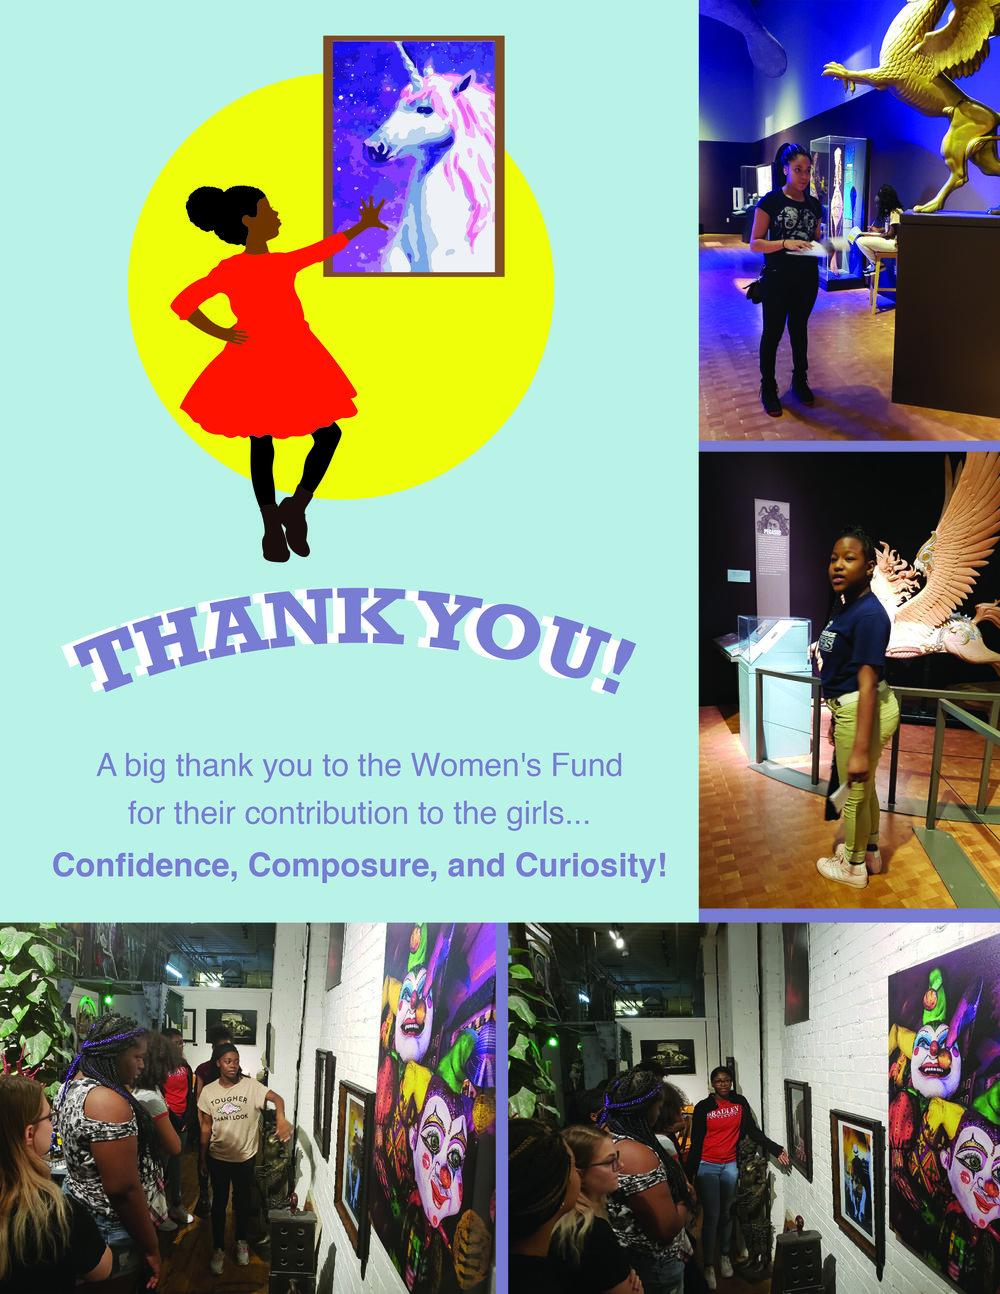 Thank you to women's fund.jpg